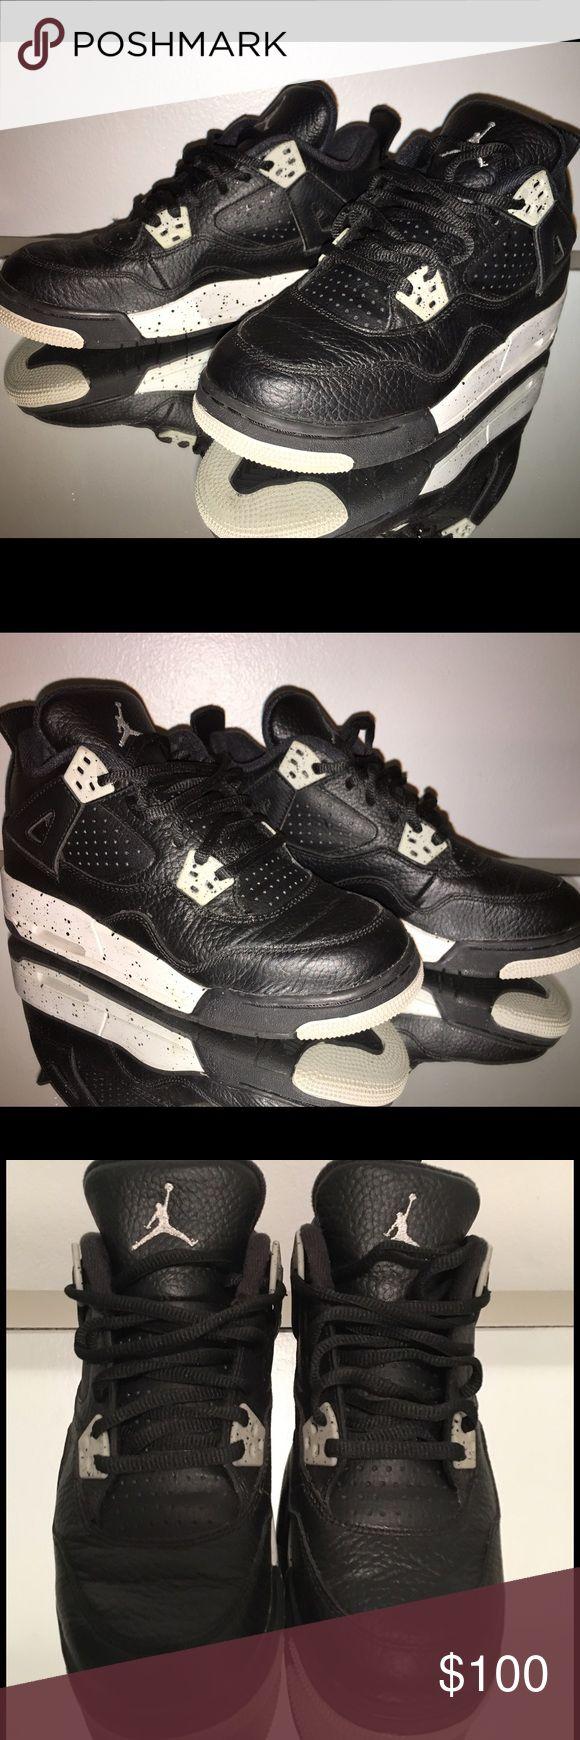 "Air Jordan 4 Retro ""Oreo"" Black/Grey sz 5 Jordan Retro 4 ""Oreo"" black and grey in boy's size 5. Fits women's size 7-7.5. Worn a handful of times so still in great condition. Jordan Shoes Sneakers"